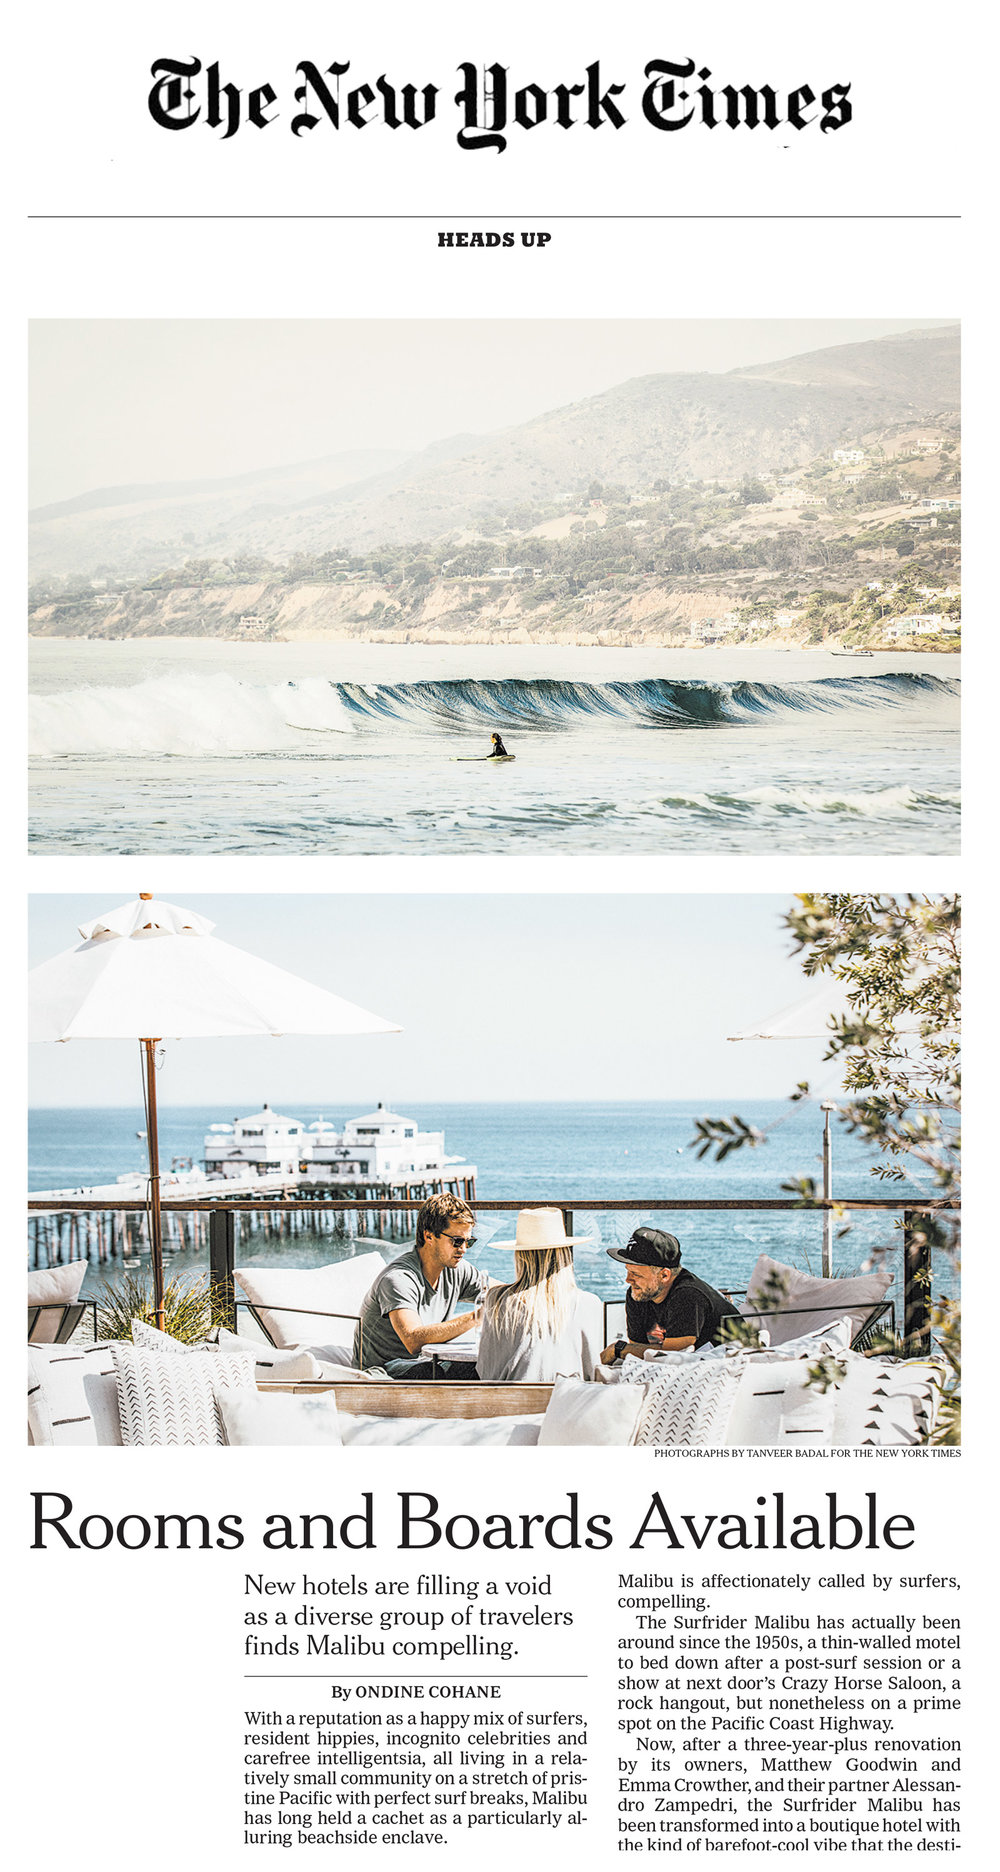 malibu-california-new-york-times-travel.jpg